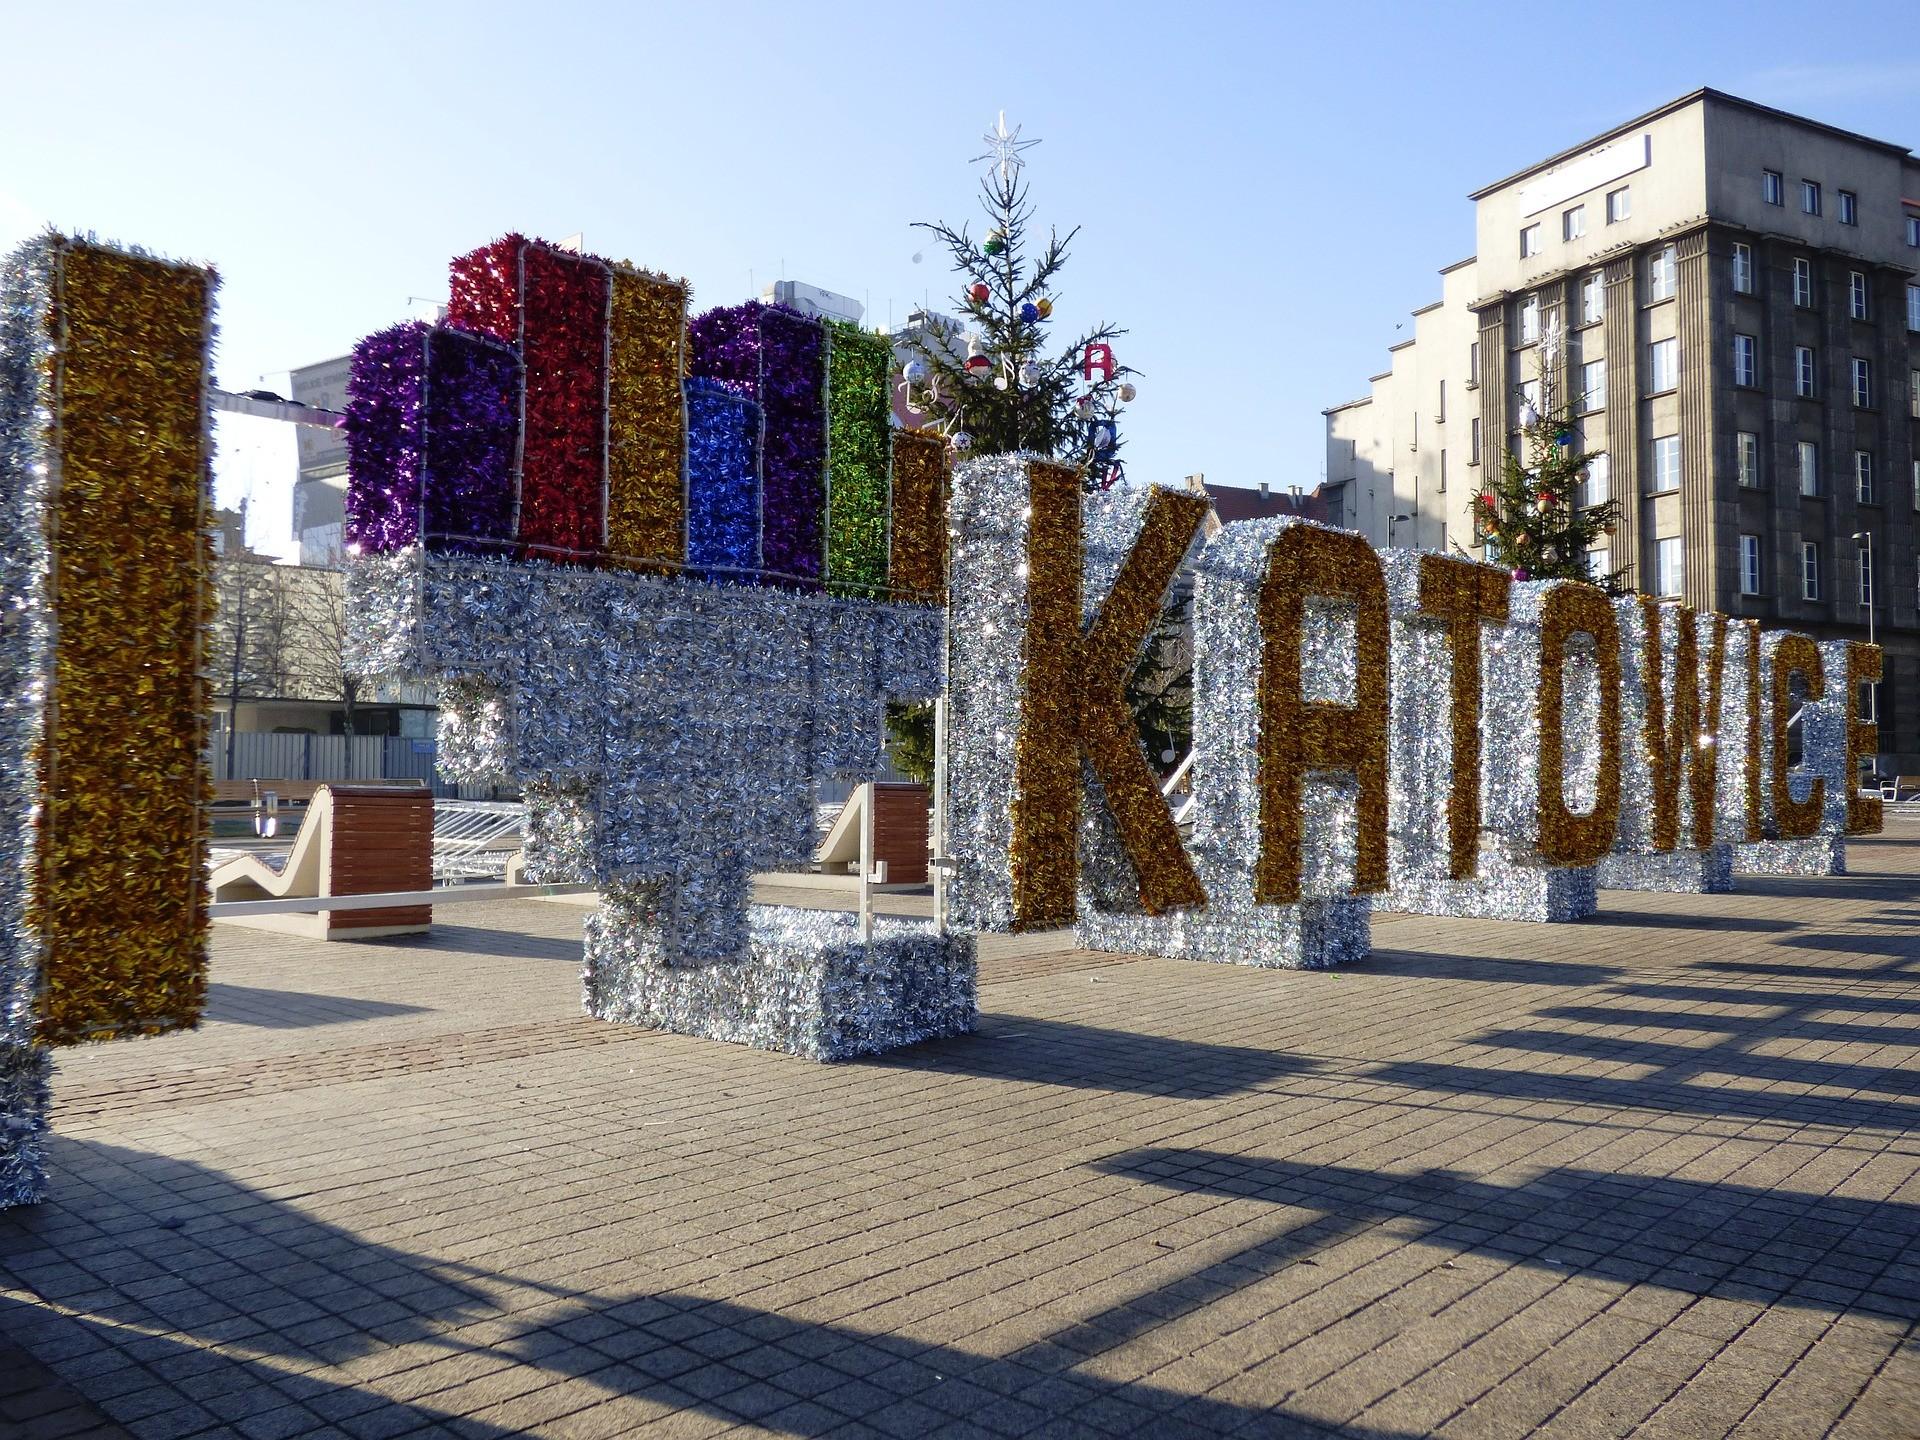 Experiencia Erasmus en Katowice, Polonia, por Madalina